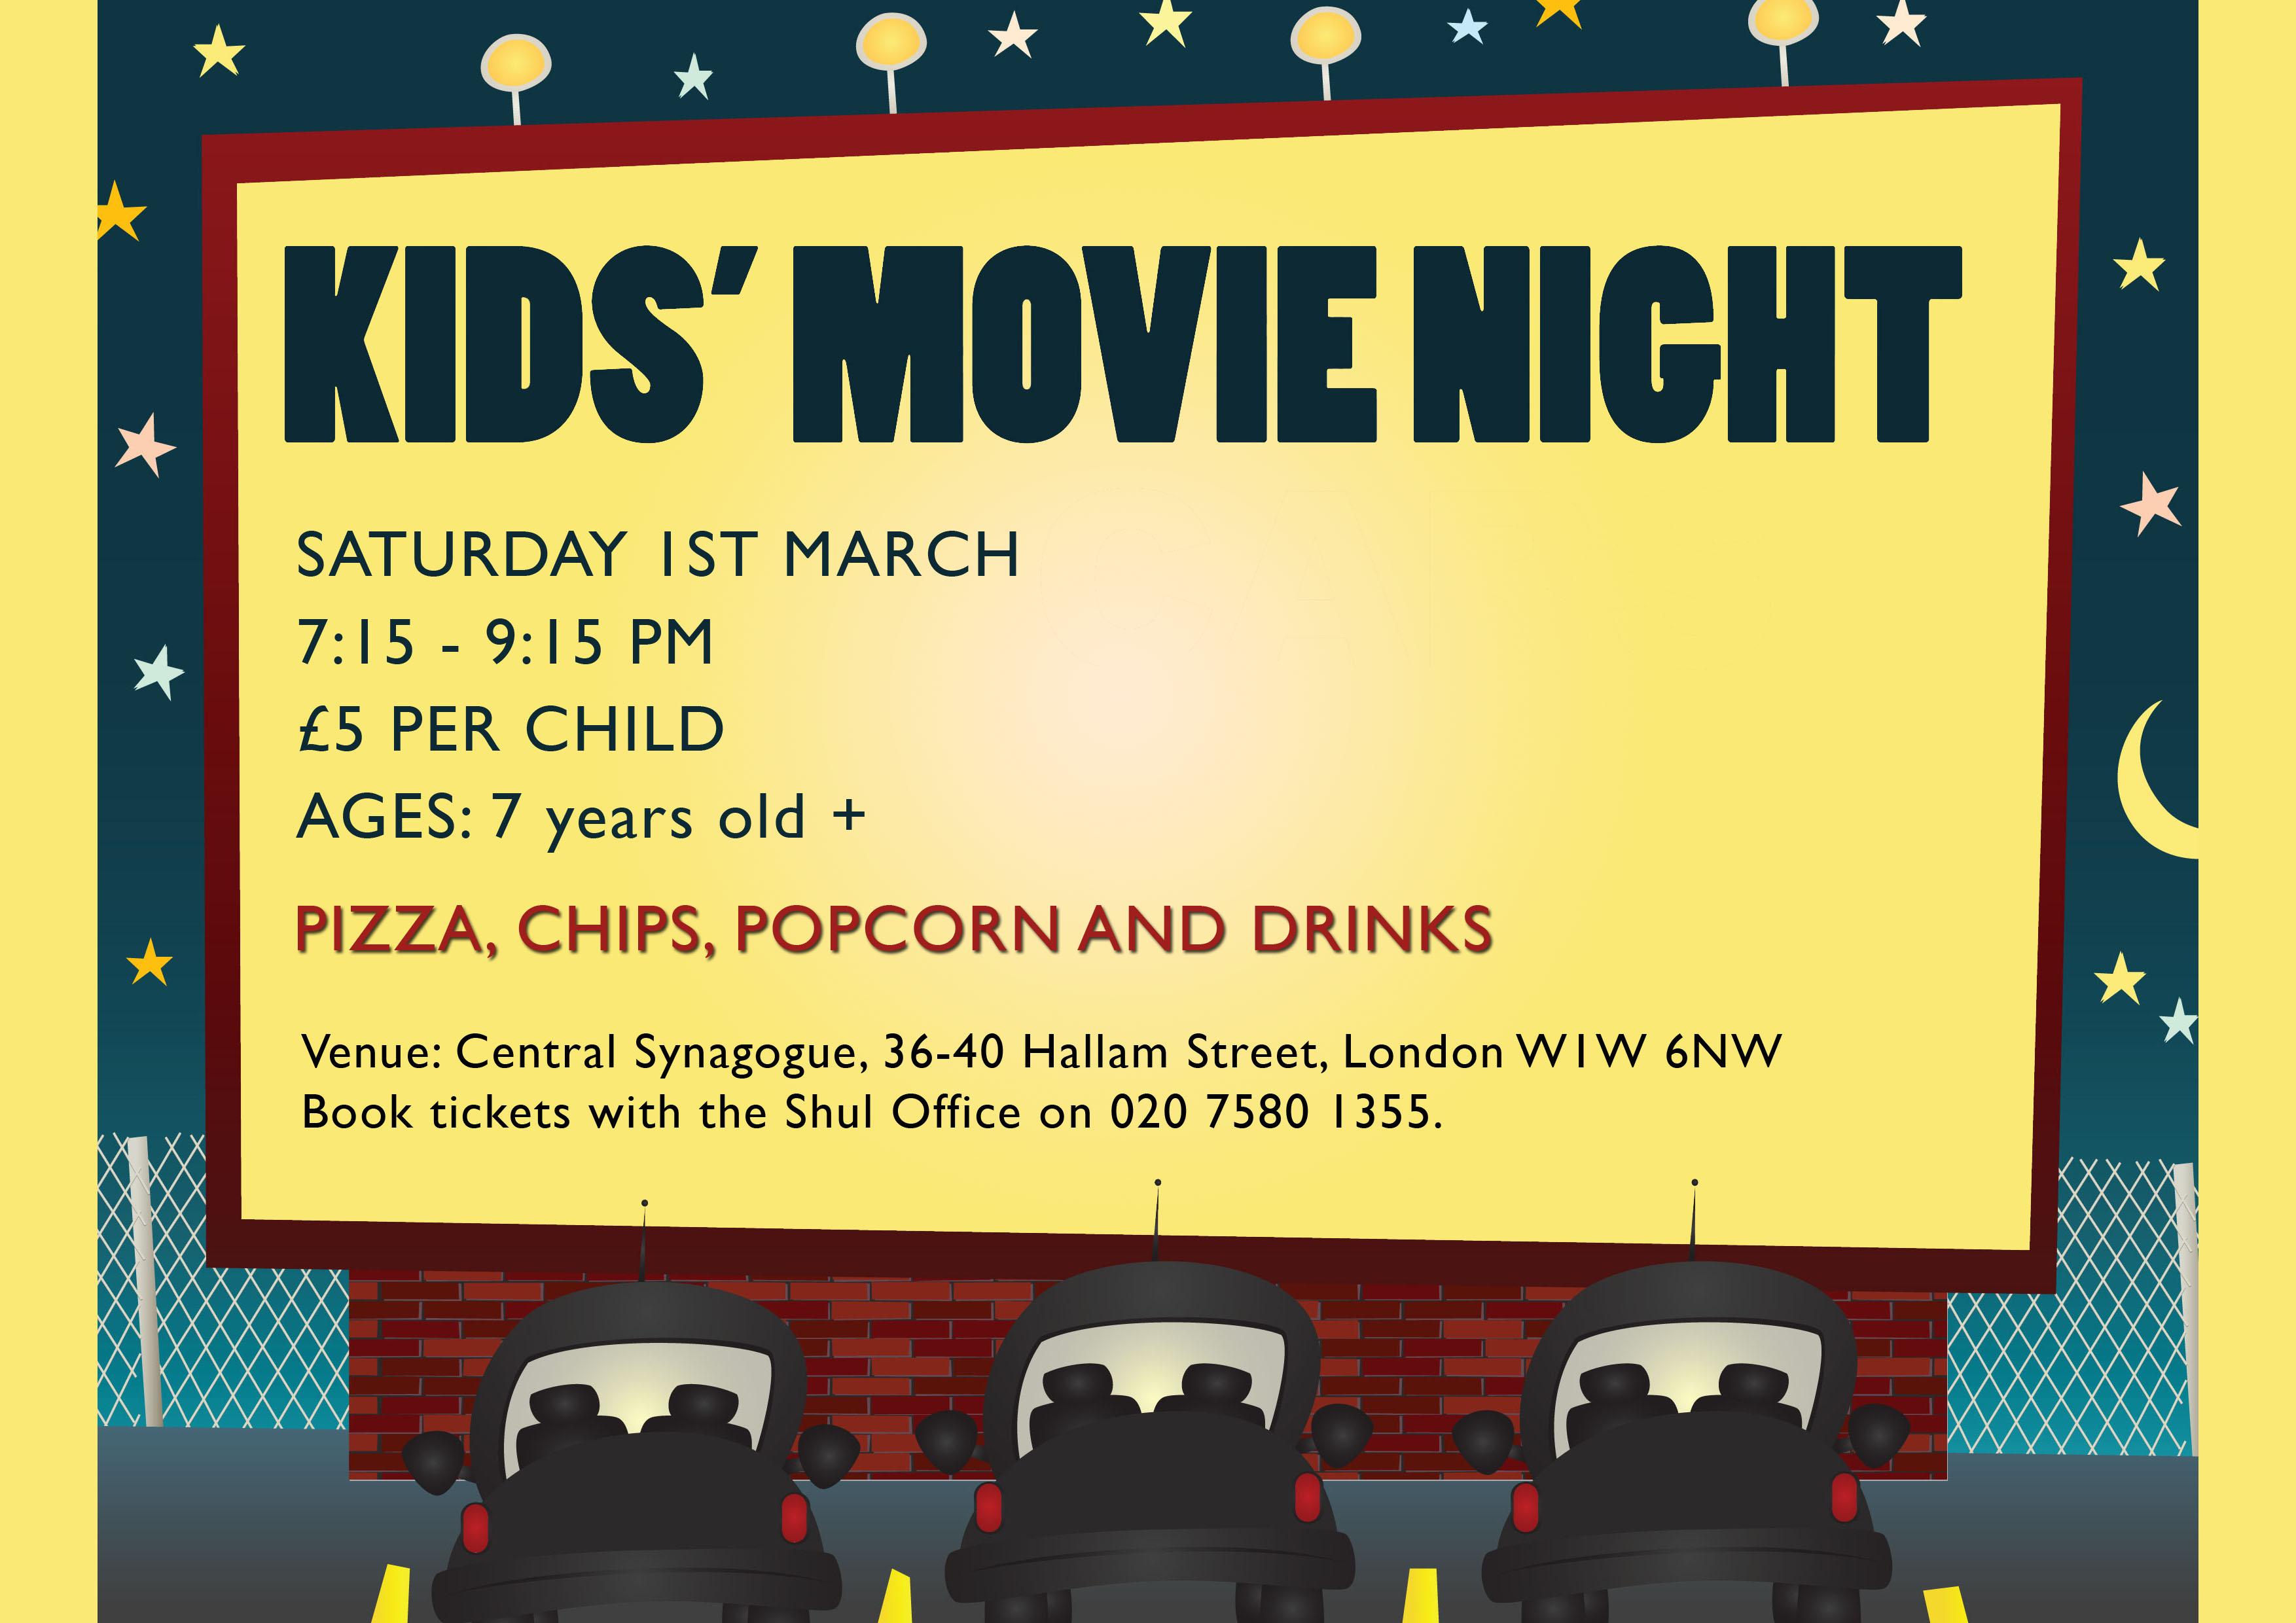 Kids movie night 1 March 2014 copy